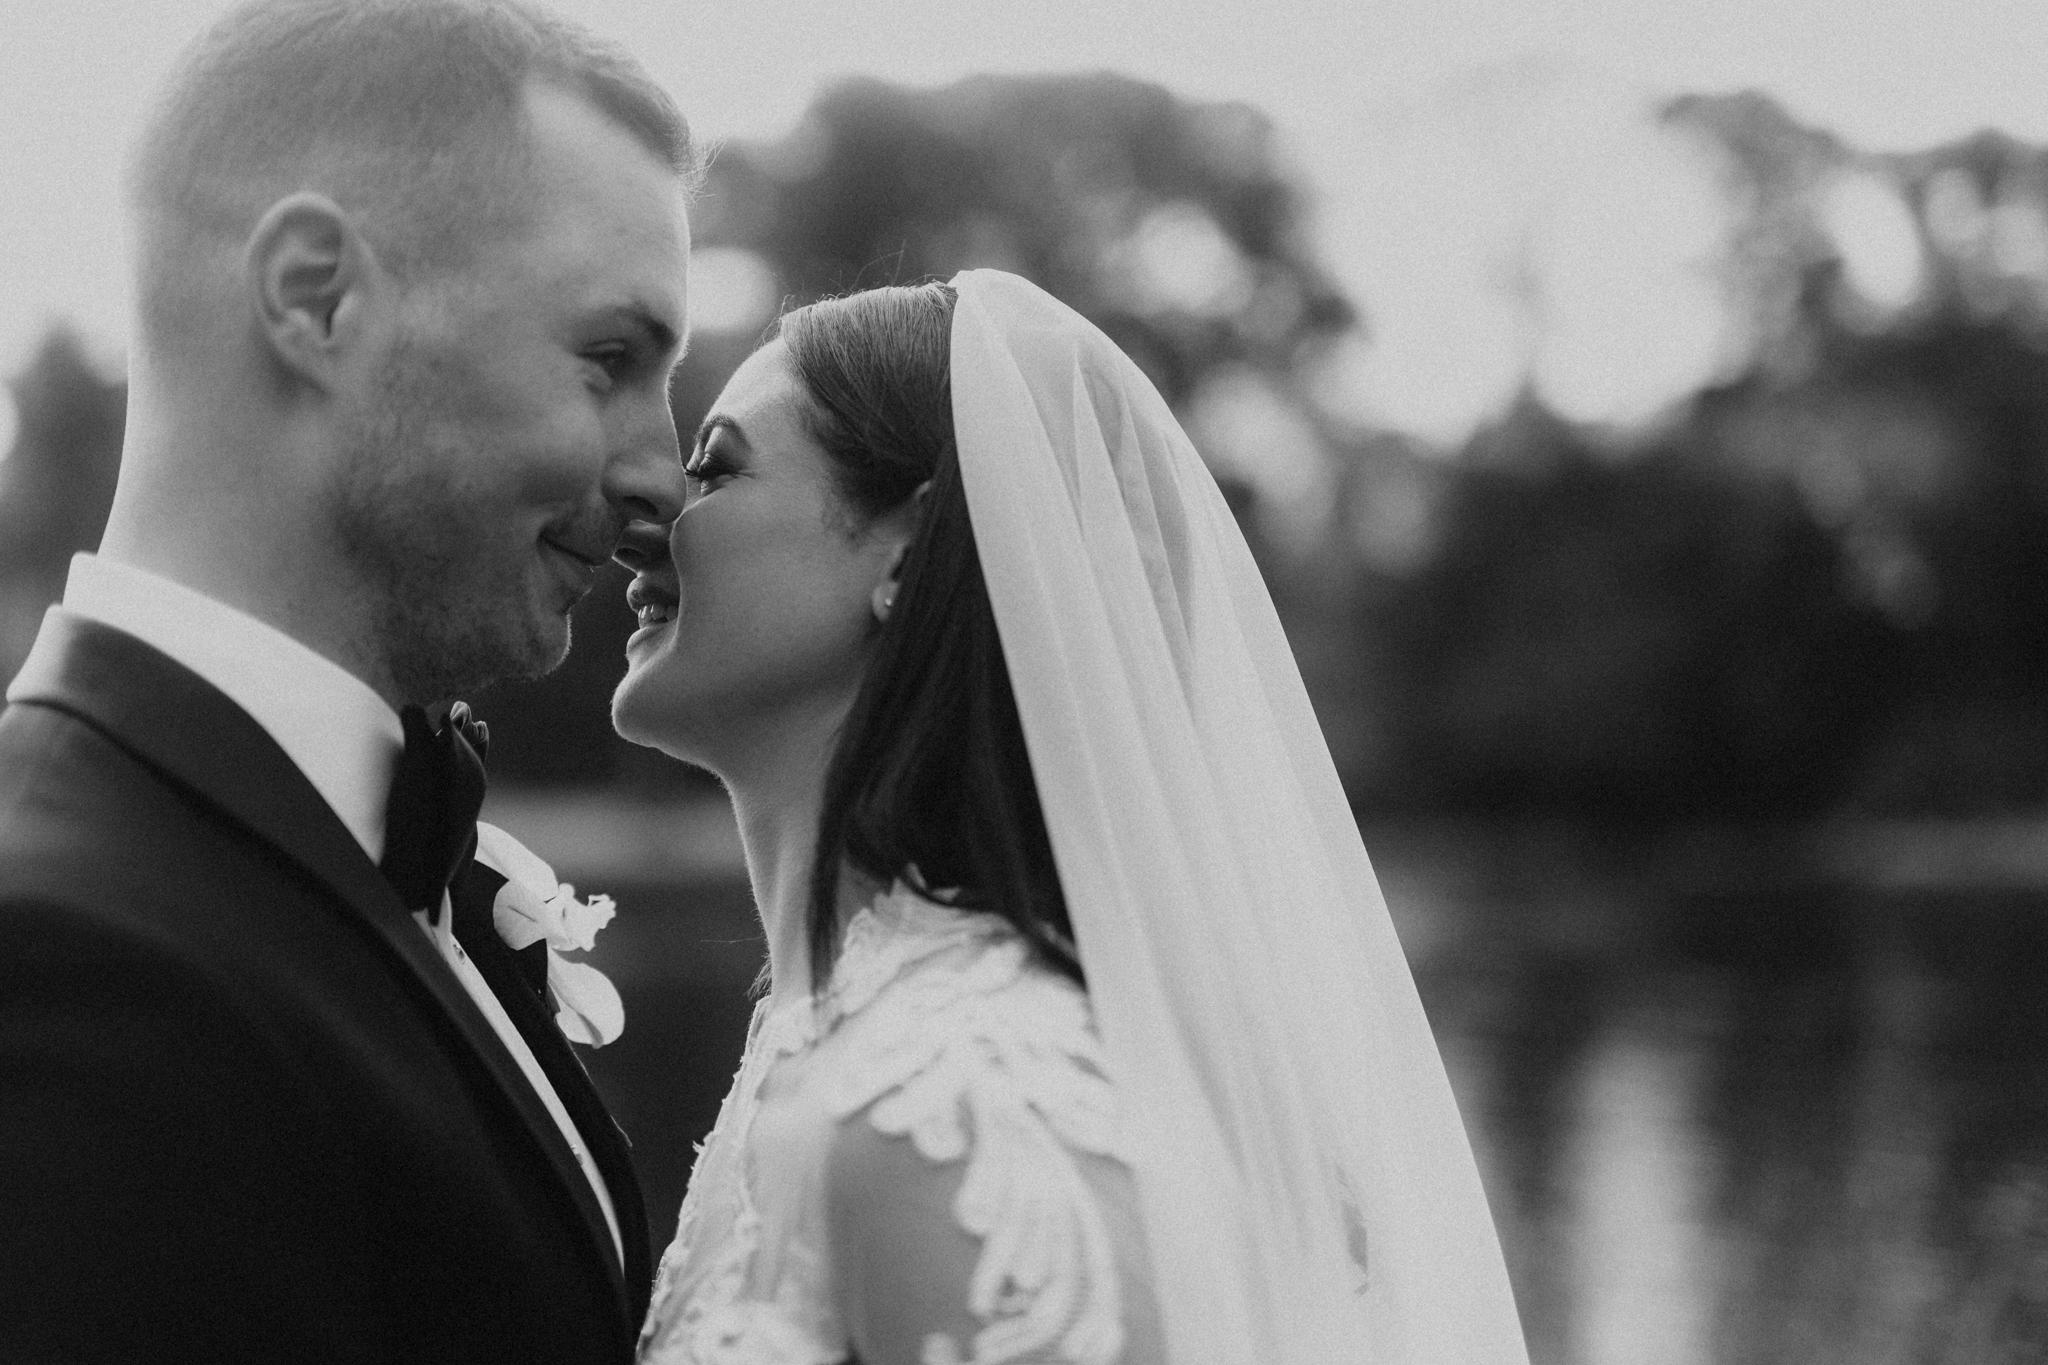 The-Terrace-Royal-Botanic-Gardens-Wedding-Emotions-and-Math-Photography-091.jpg